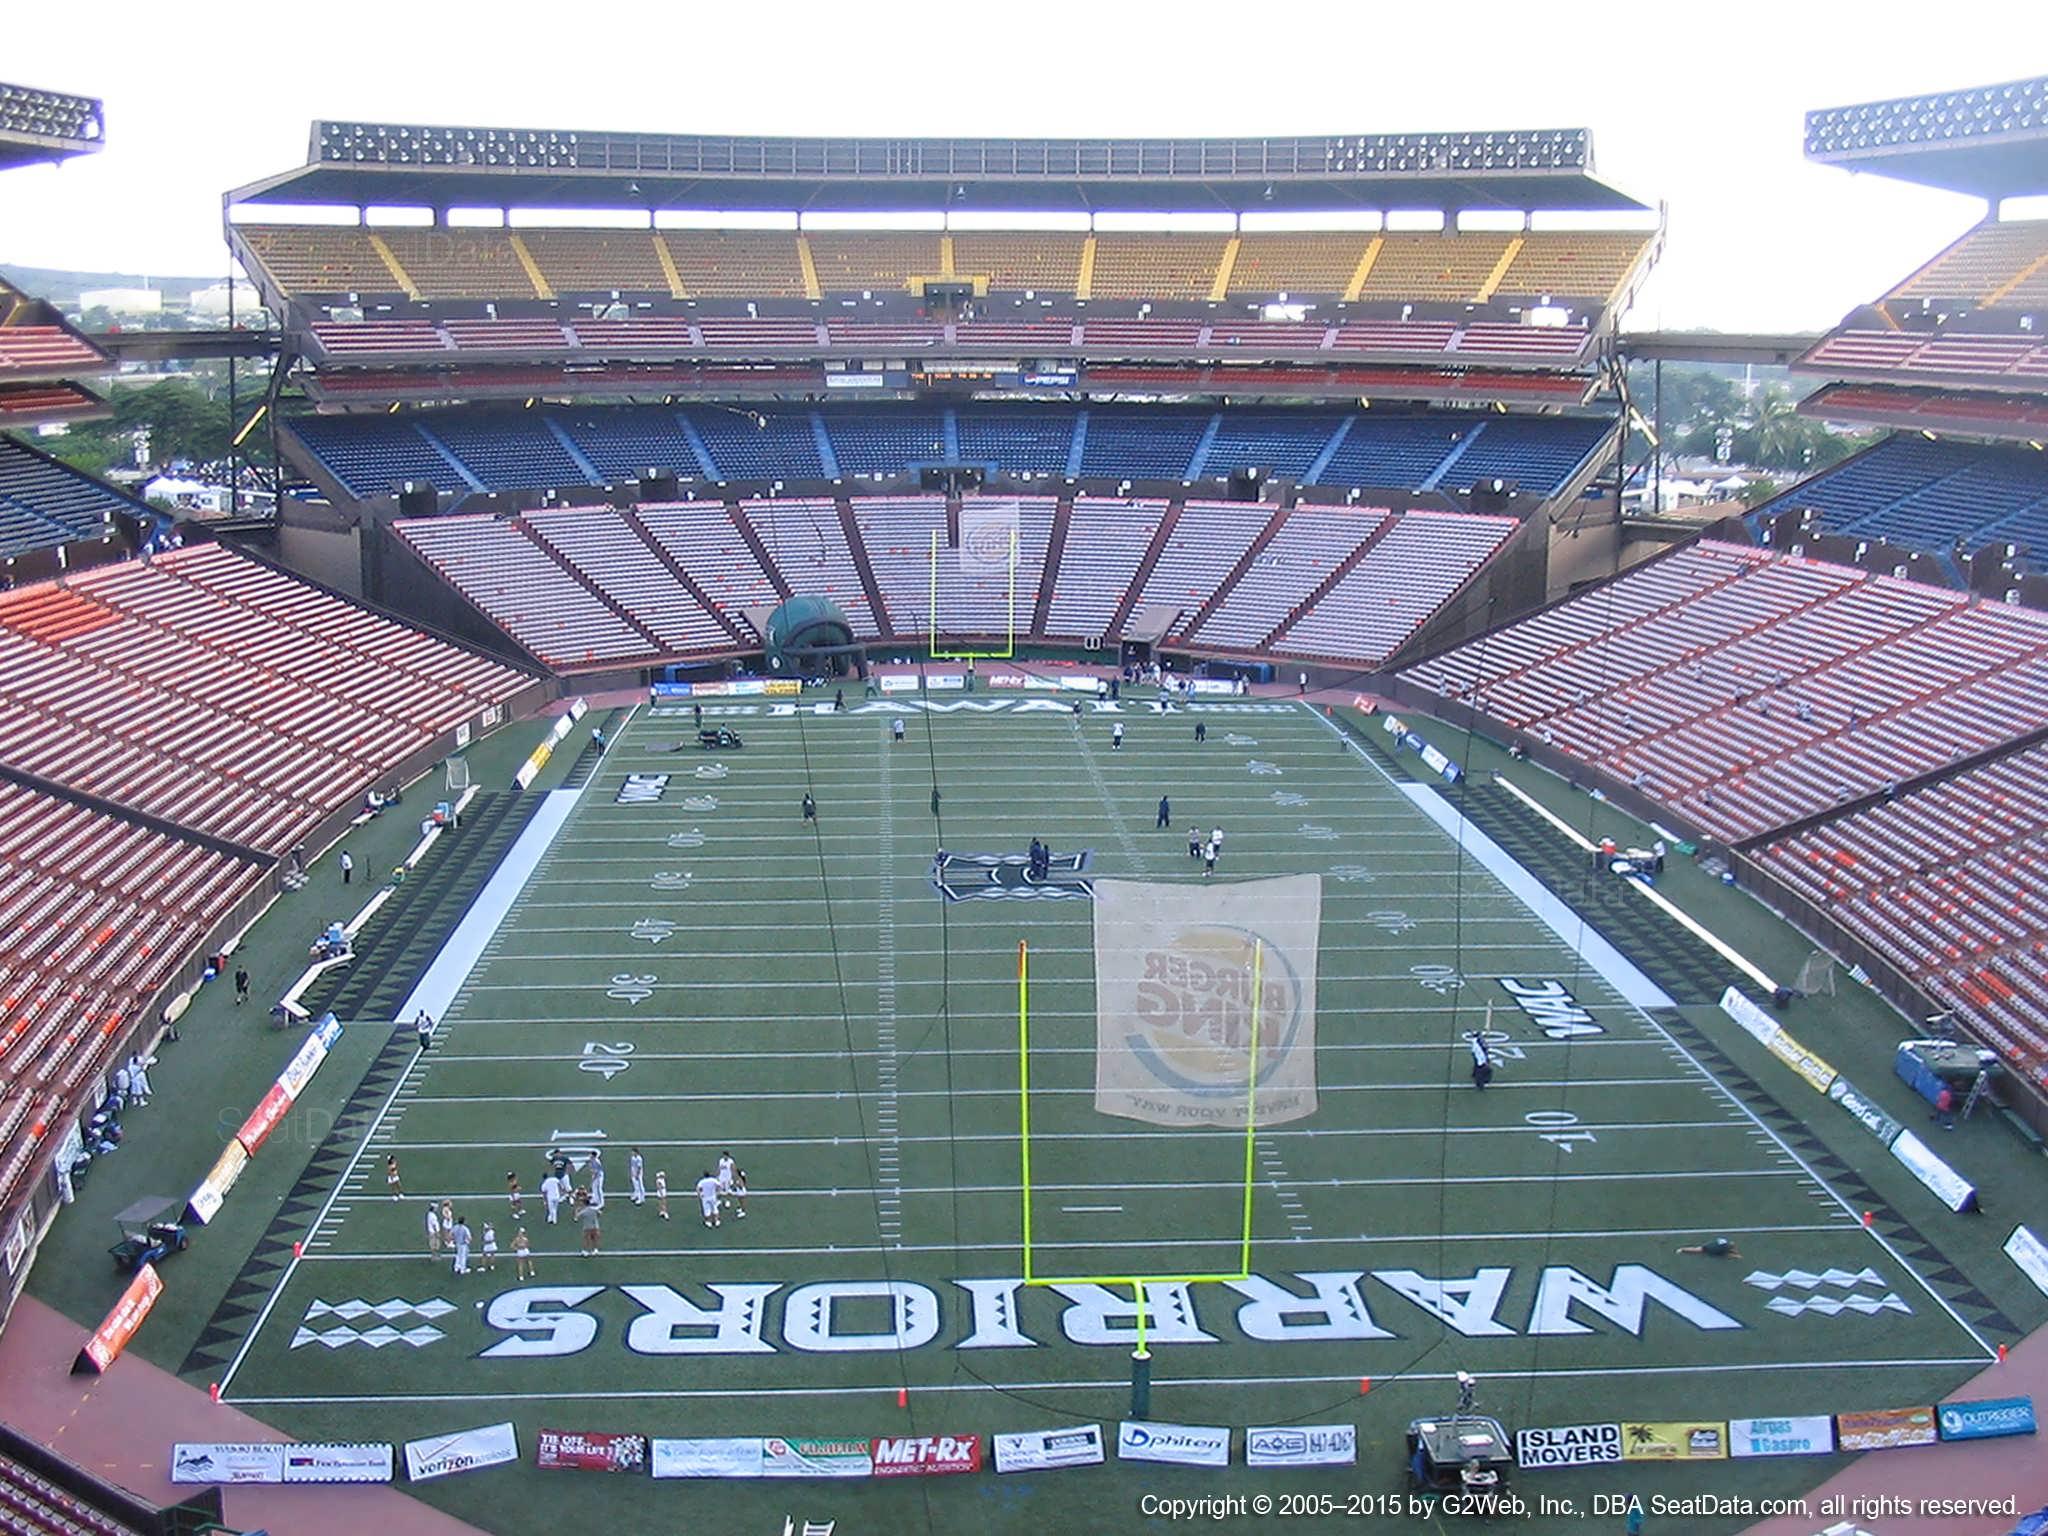 Aloha Stadium Seating Chart Rows